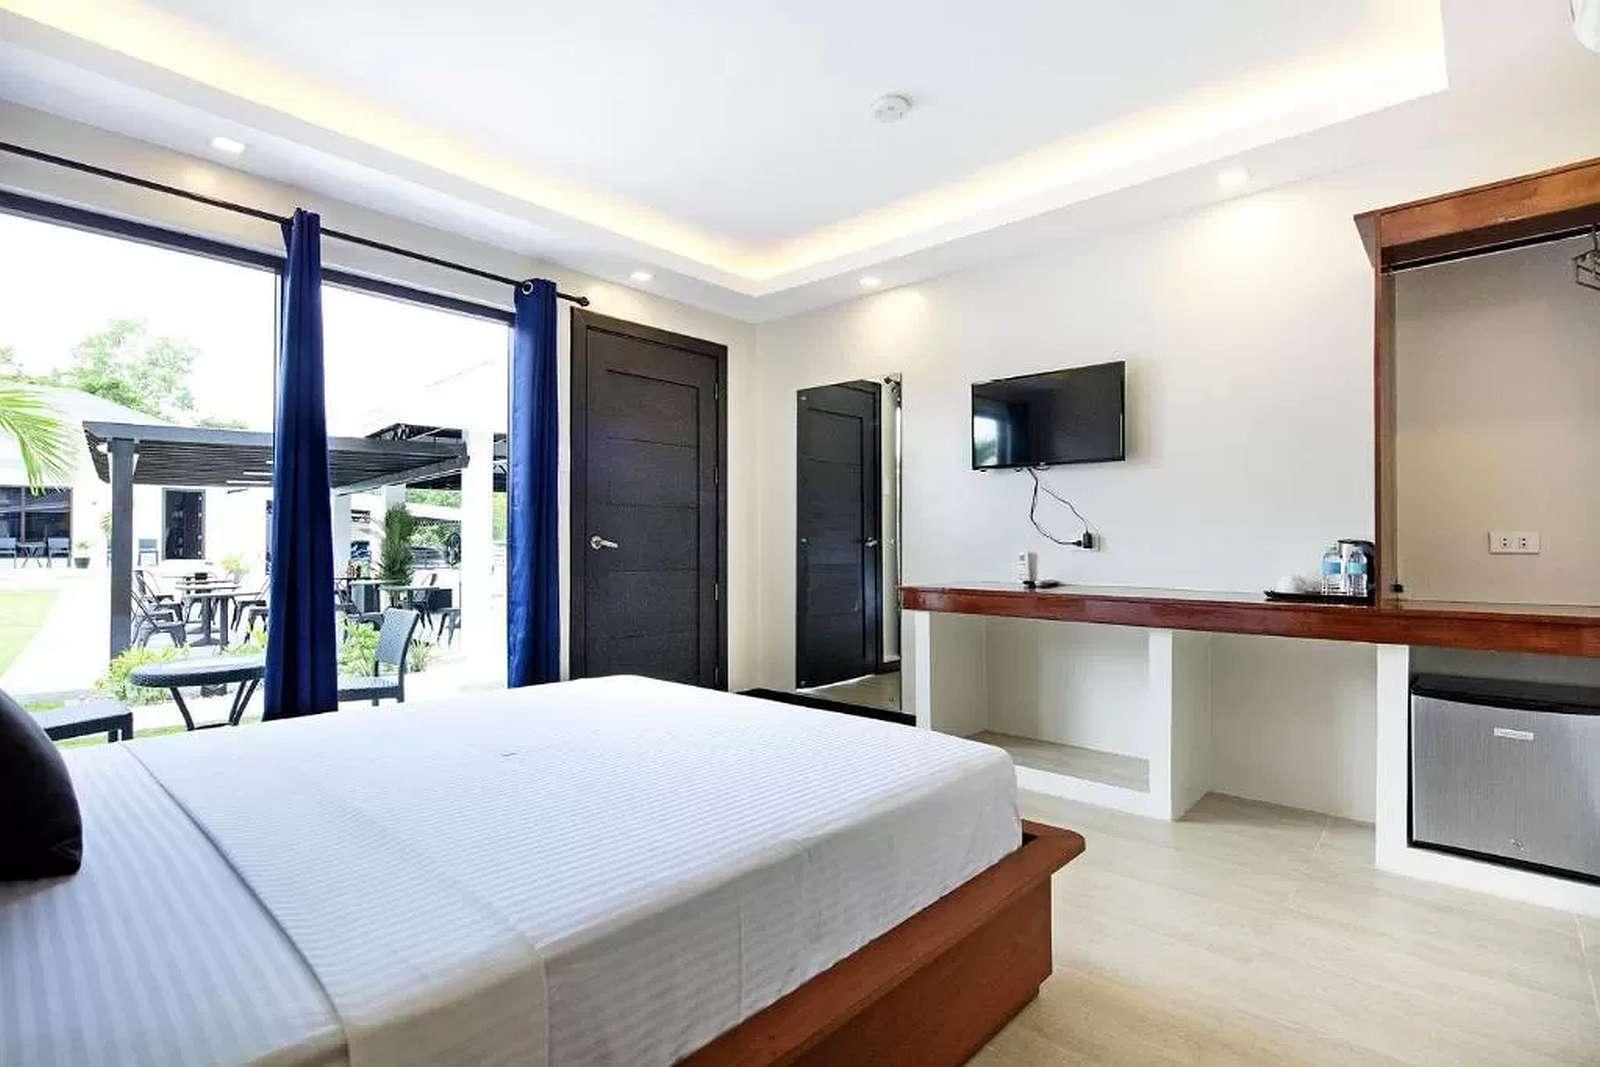 Ohana panglao resort bohol book here for discount rates (3)